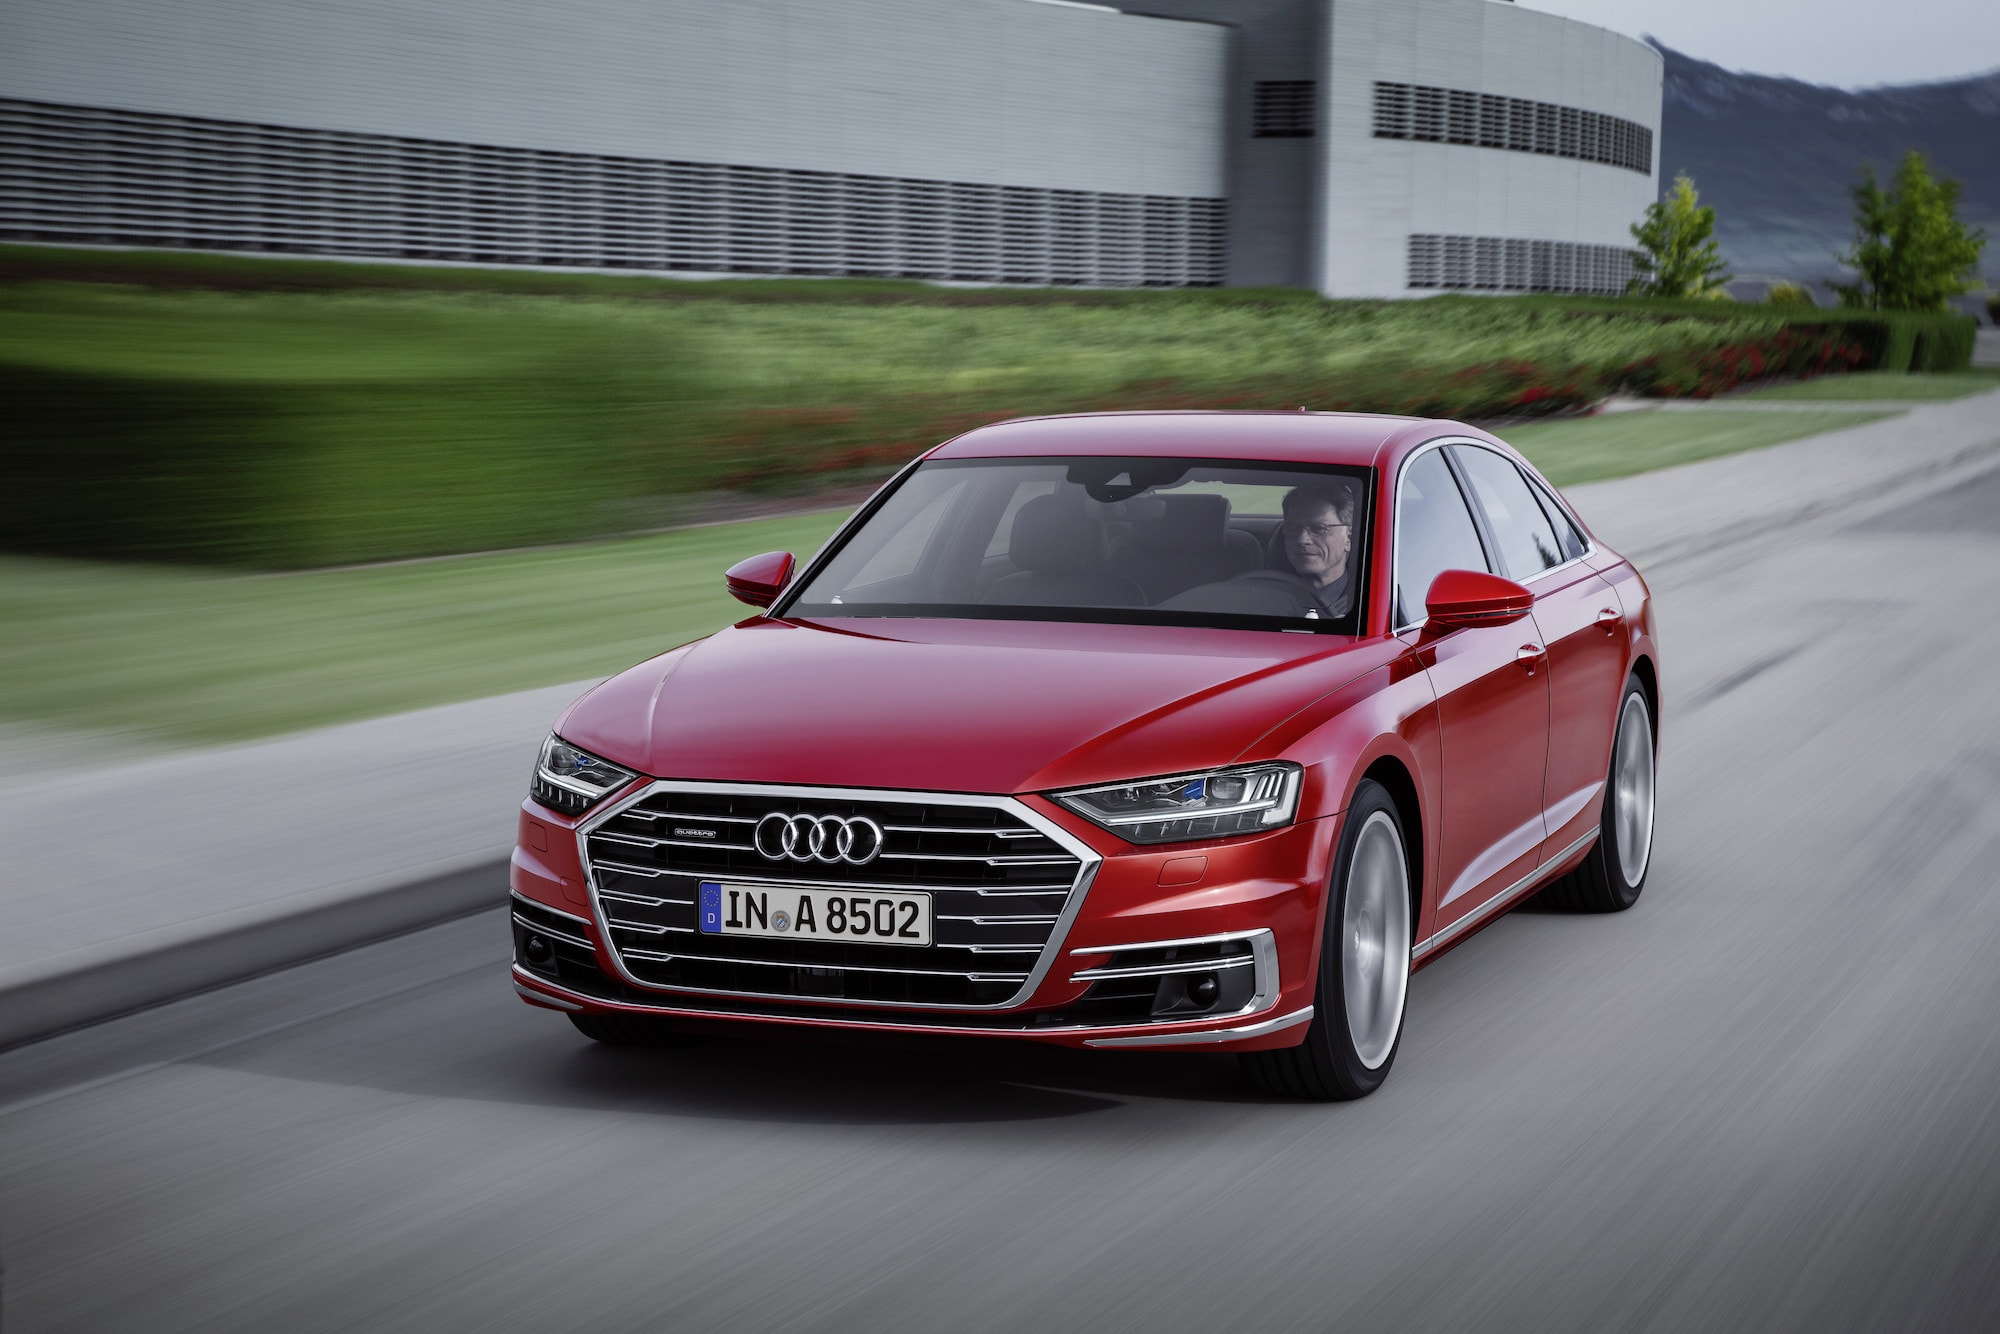 Audi A8 02